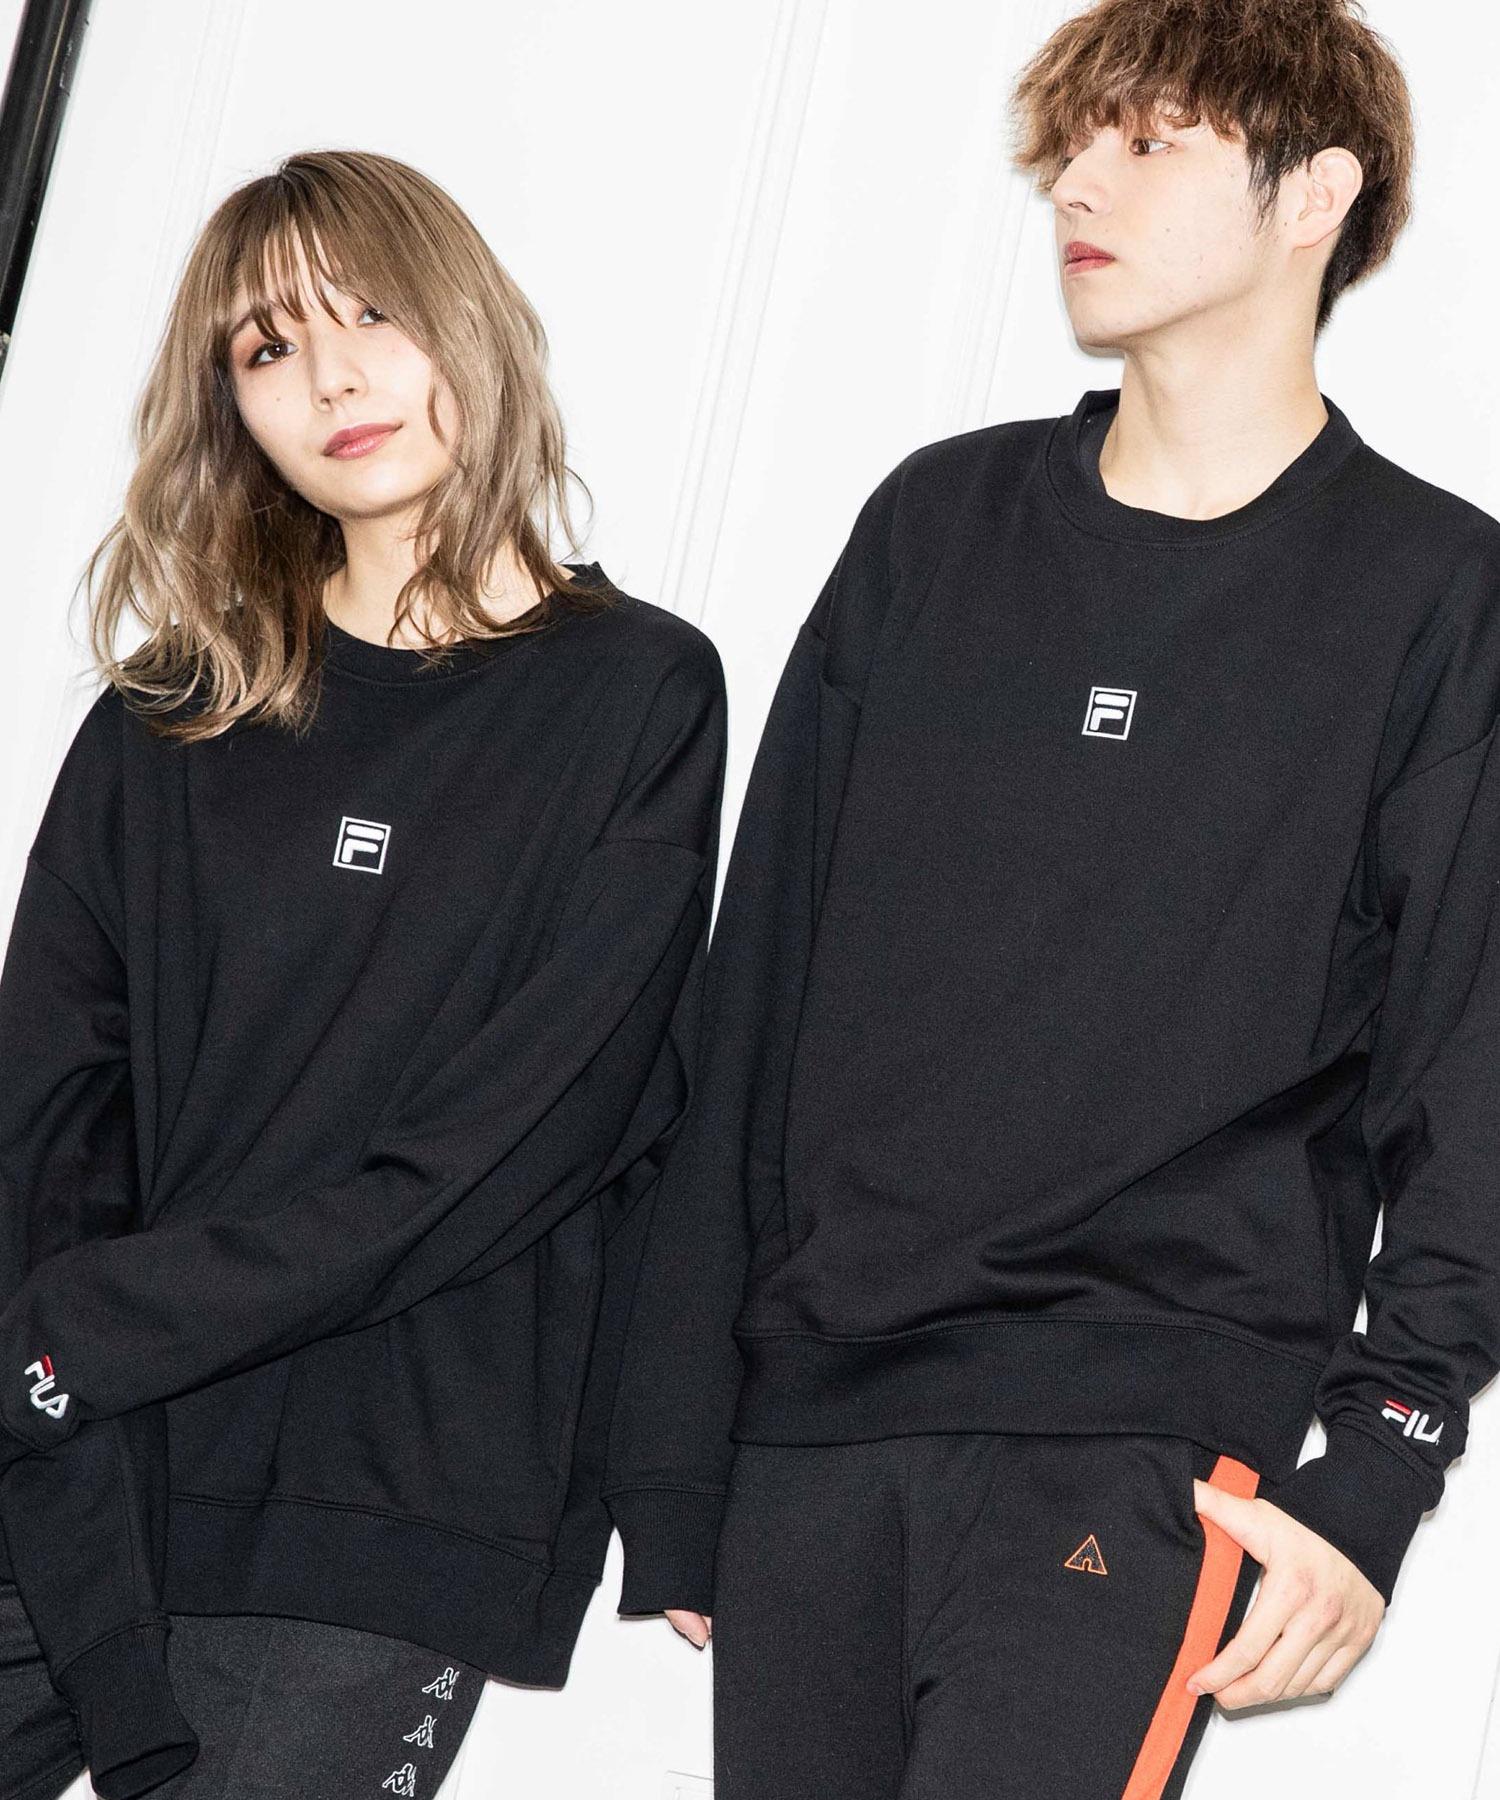 【BASQUE -enthusiastic design-】FILA/フィラ BASQUE magenta 別注 ロゴ刺繍オーバーサイズ プルオーバースウェット